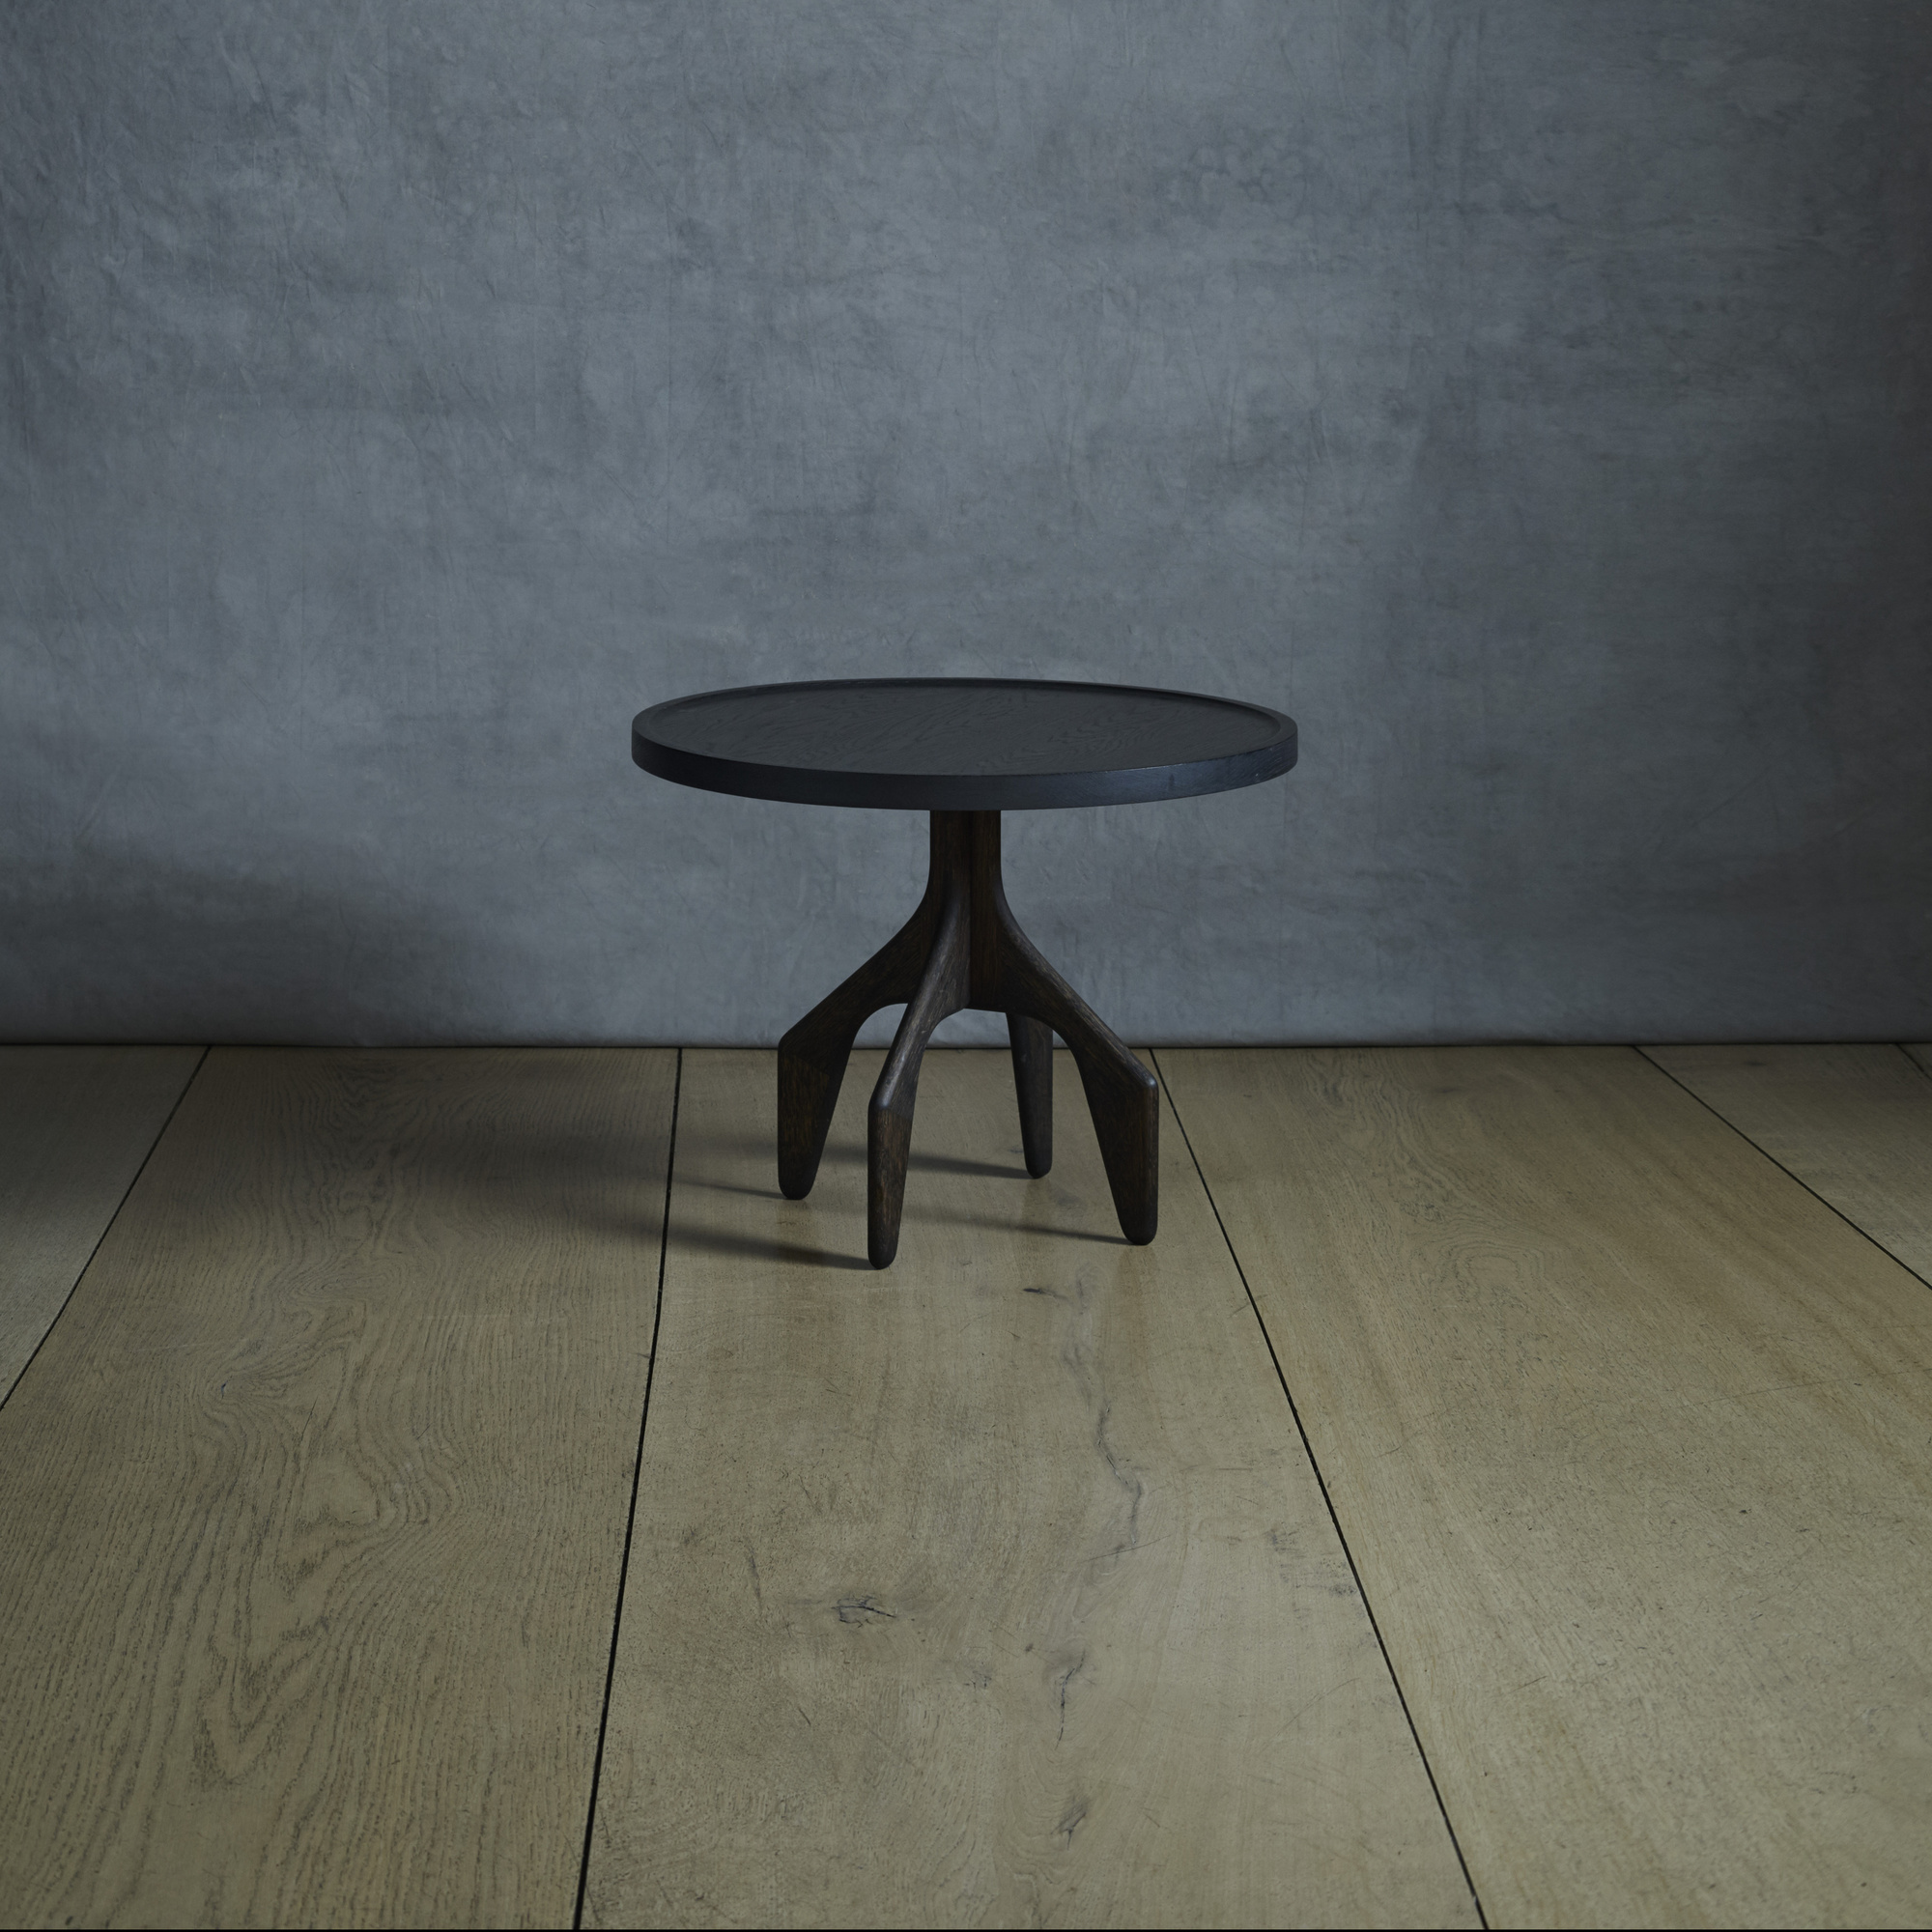 260 SPACE Copenhagen custom coffee table noma 2 November